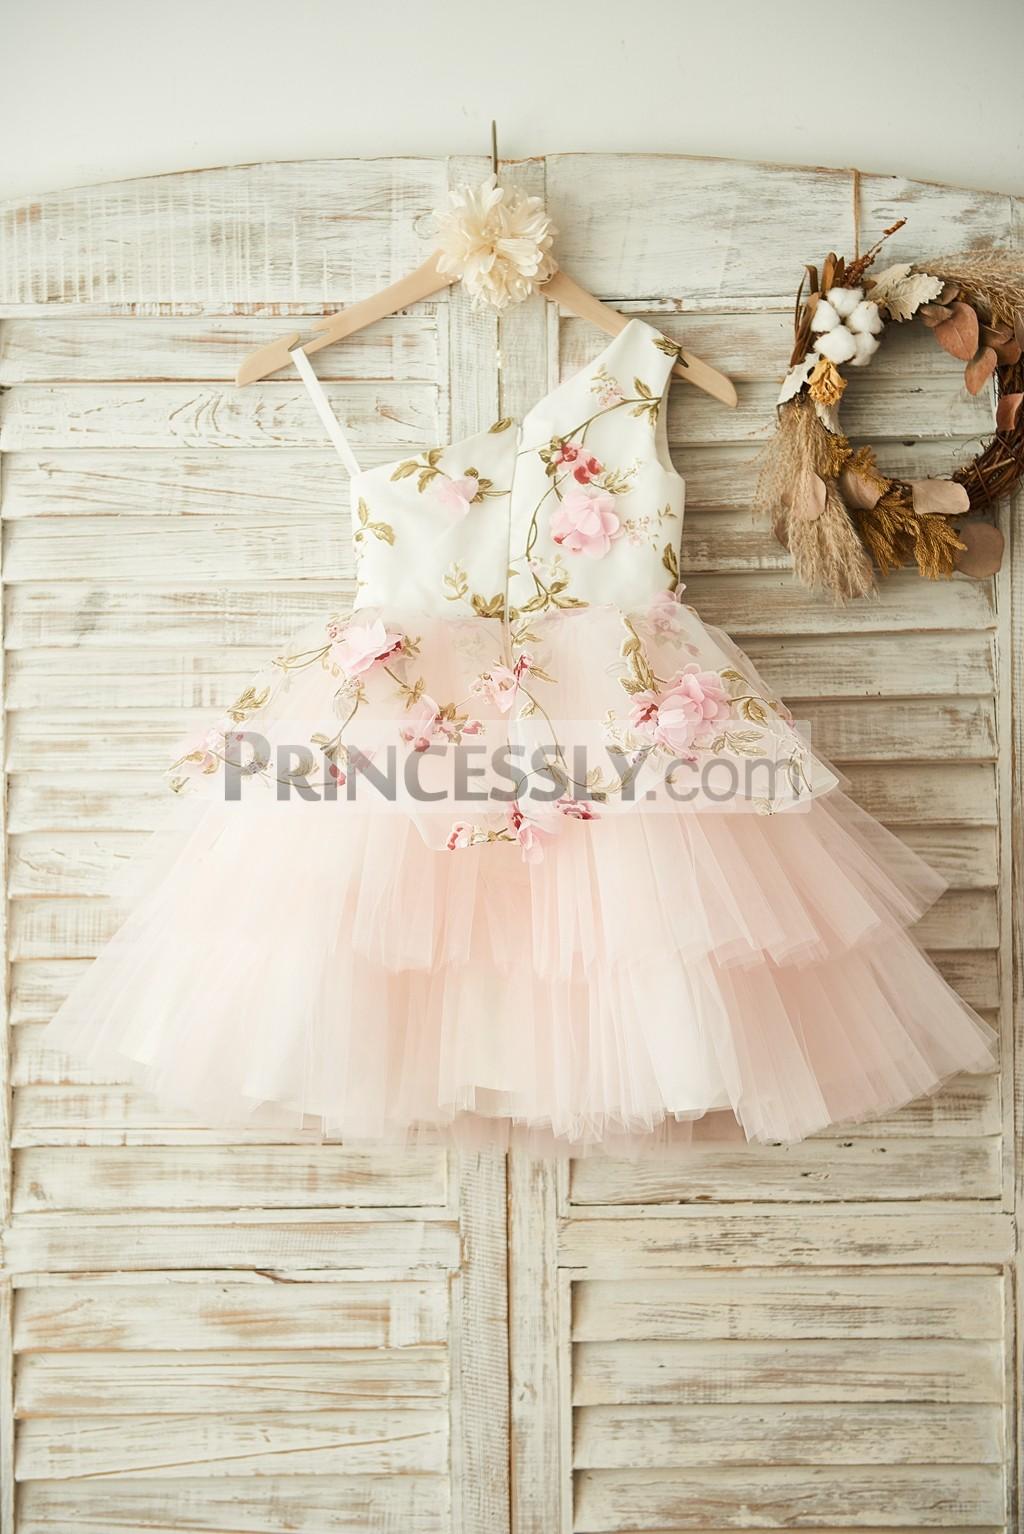 3D Flowers Pink Tulle Cupcake Skirt Wedding Little Girl Dress